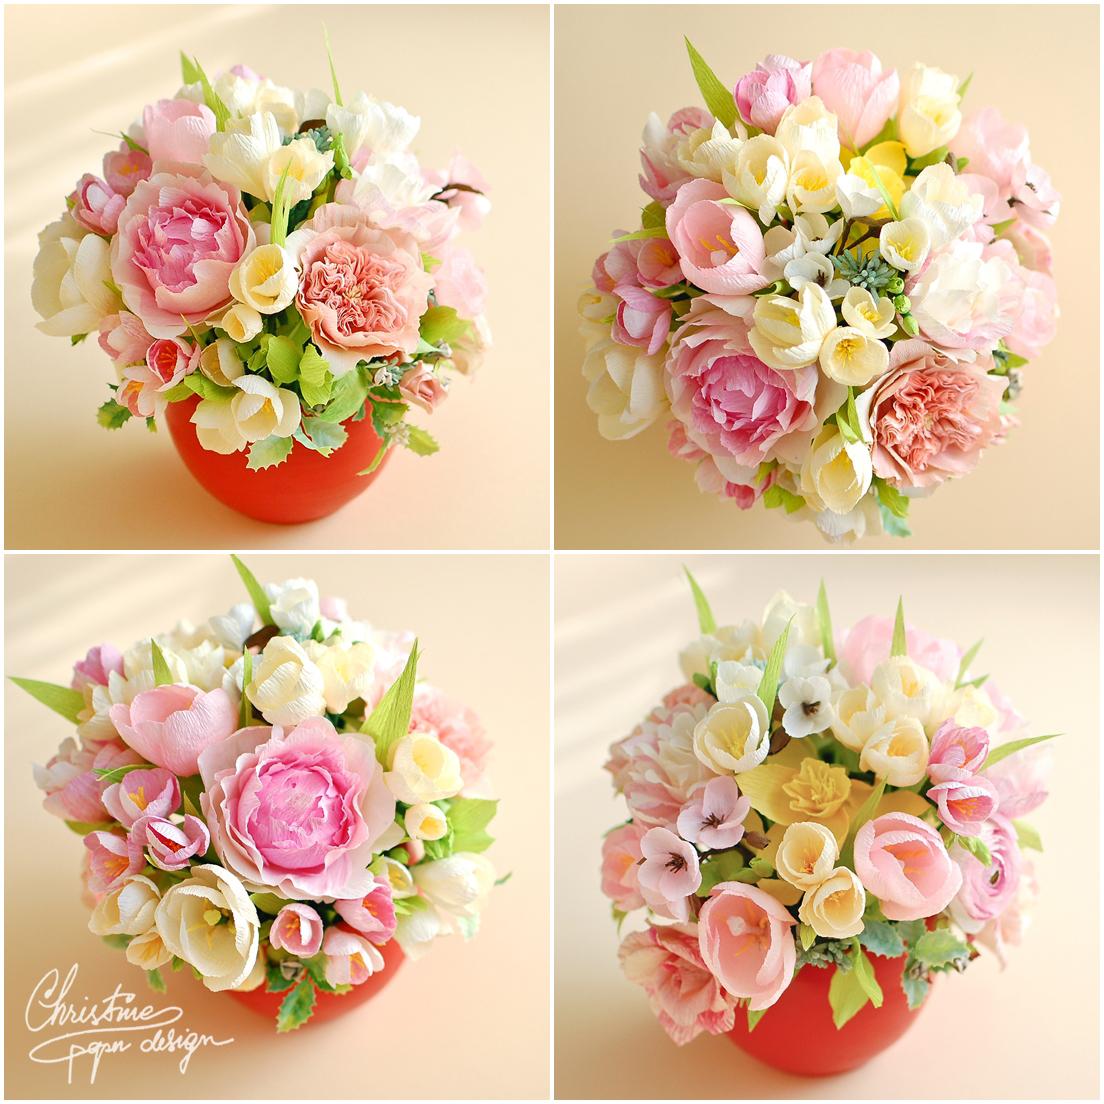 Christine paper design - spring paper flowers (7)